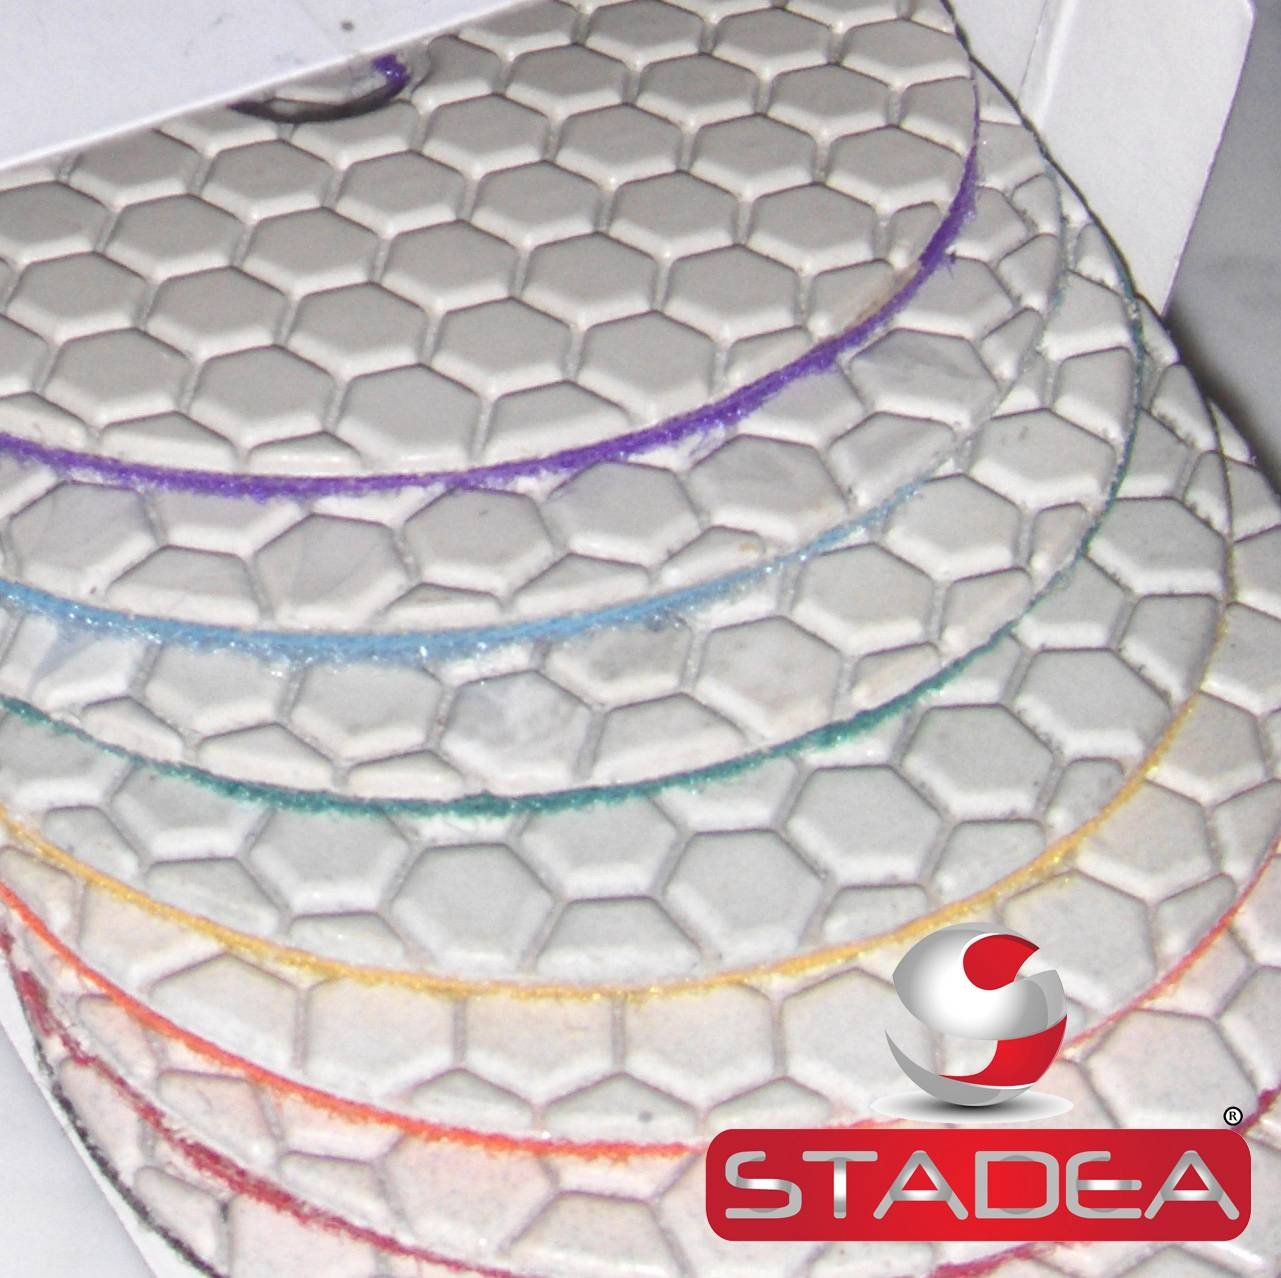 stone marble polishing kit 4'' dry - Diamond Polishing Pads Rubber Backing Pads Set By STADEA